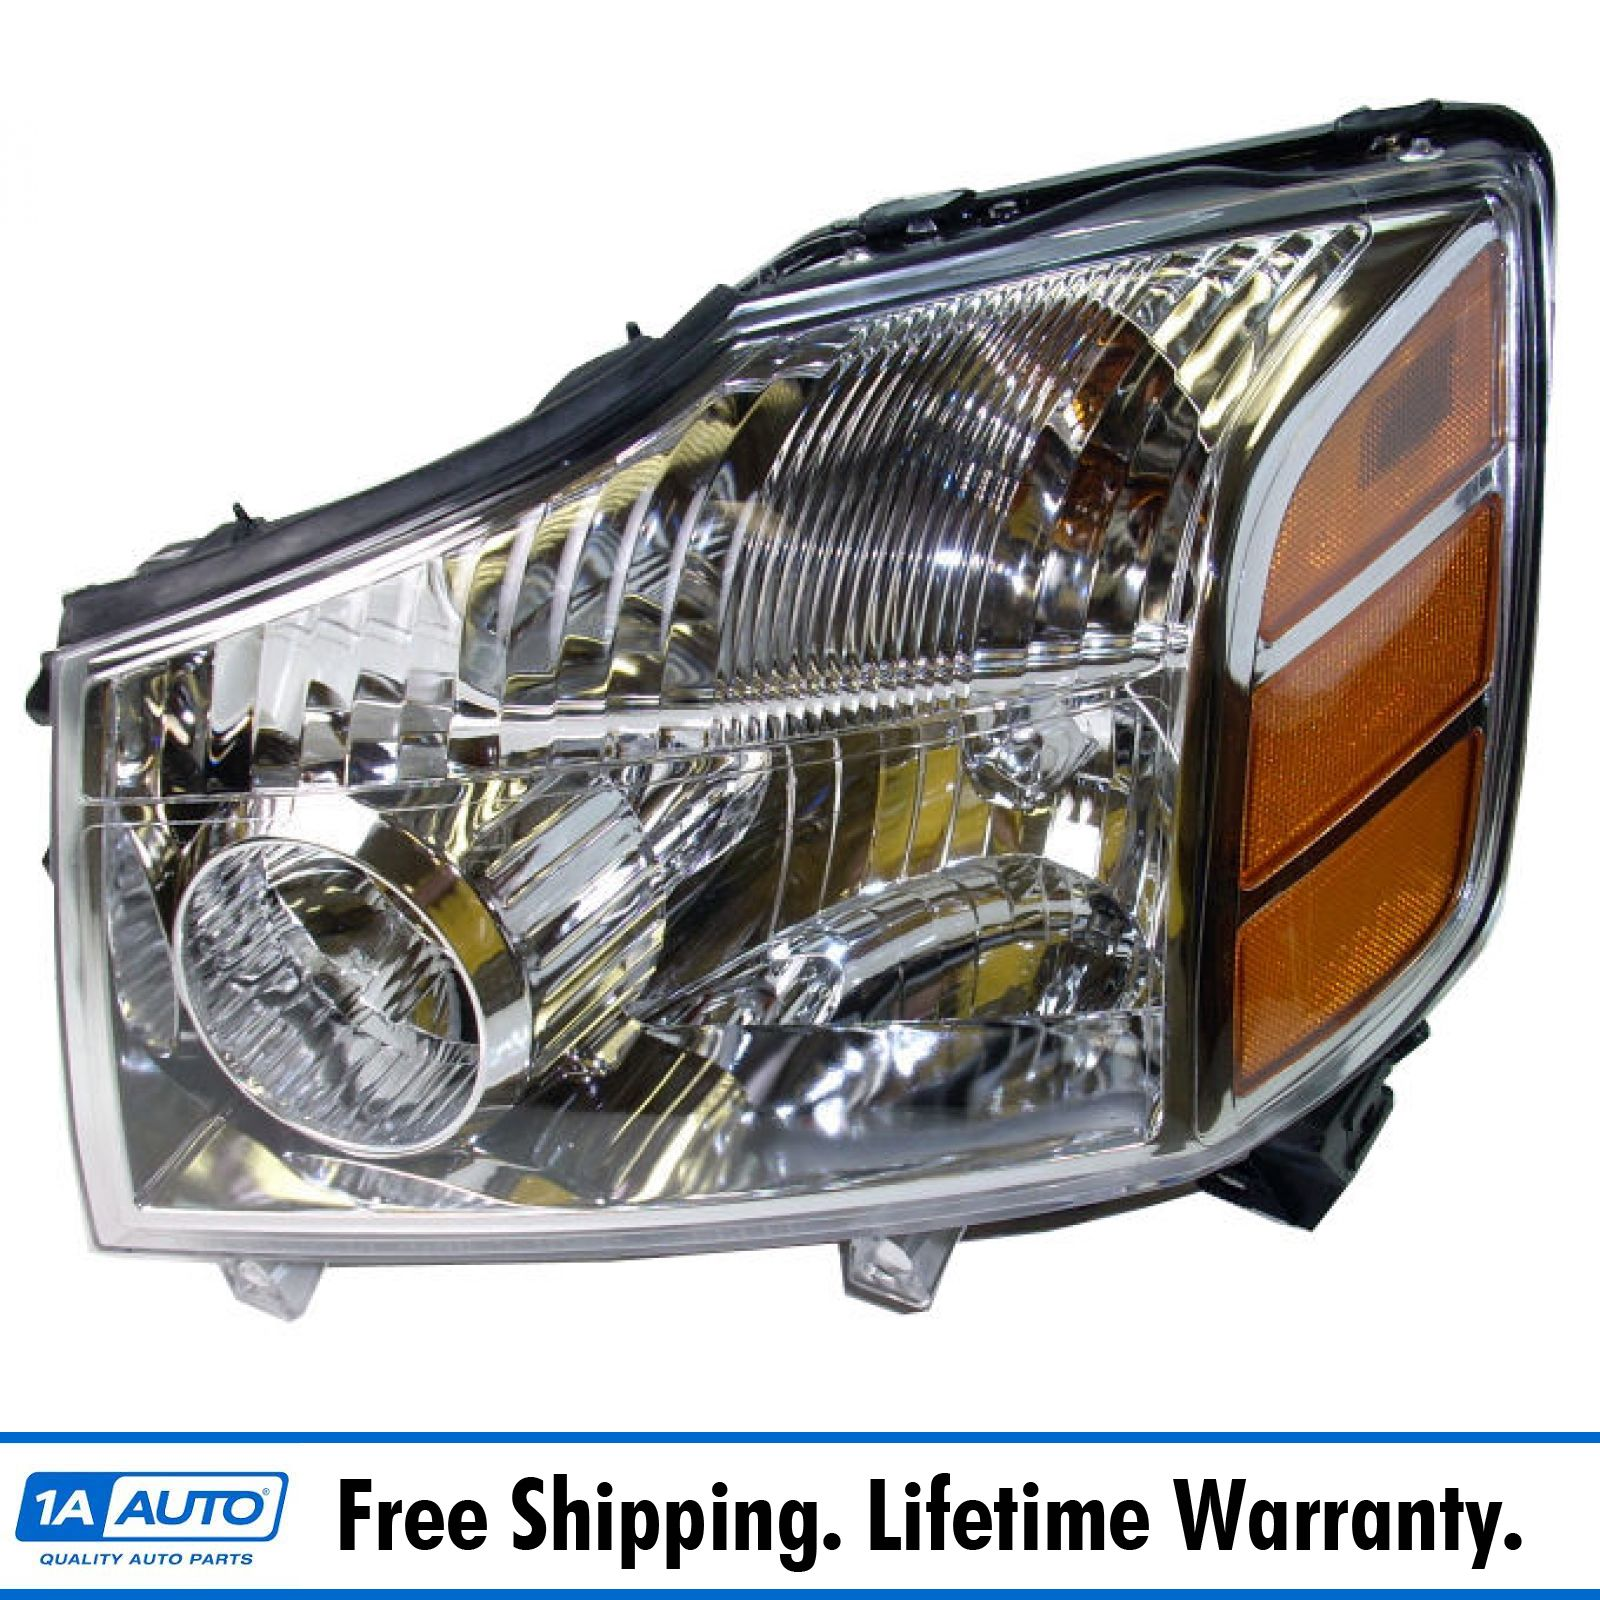 Fits 2004-2007 Nissan Armada Titan Headlight Headlamp Left Driver Side LH